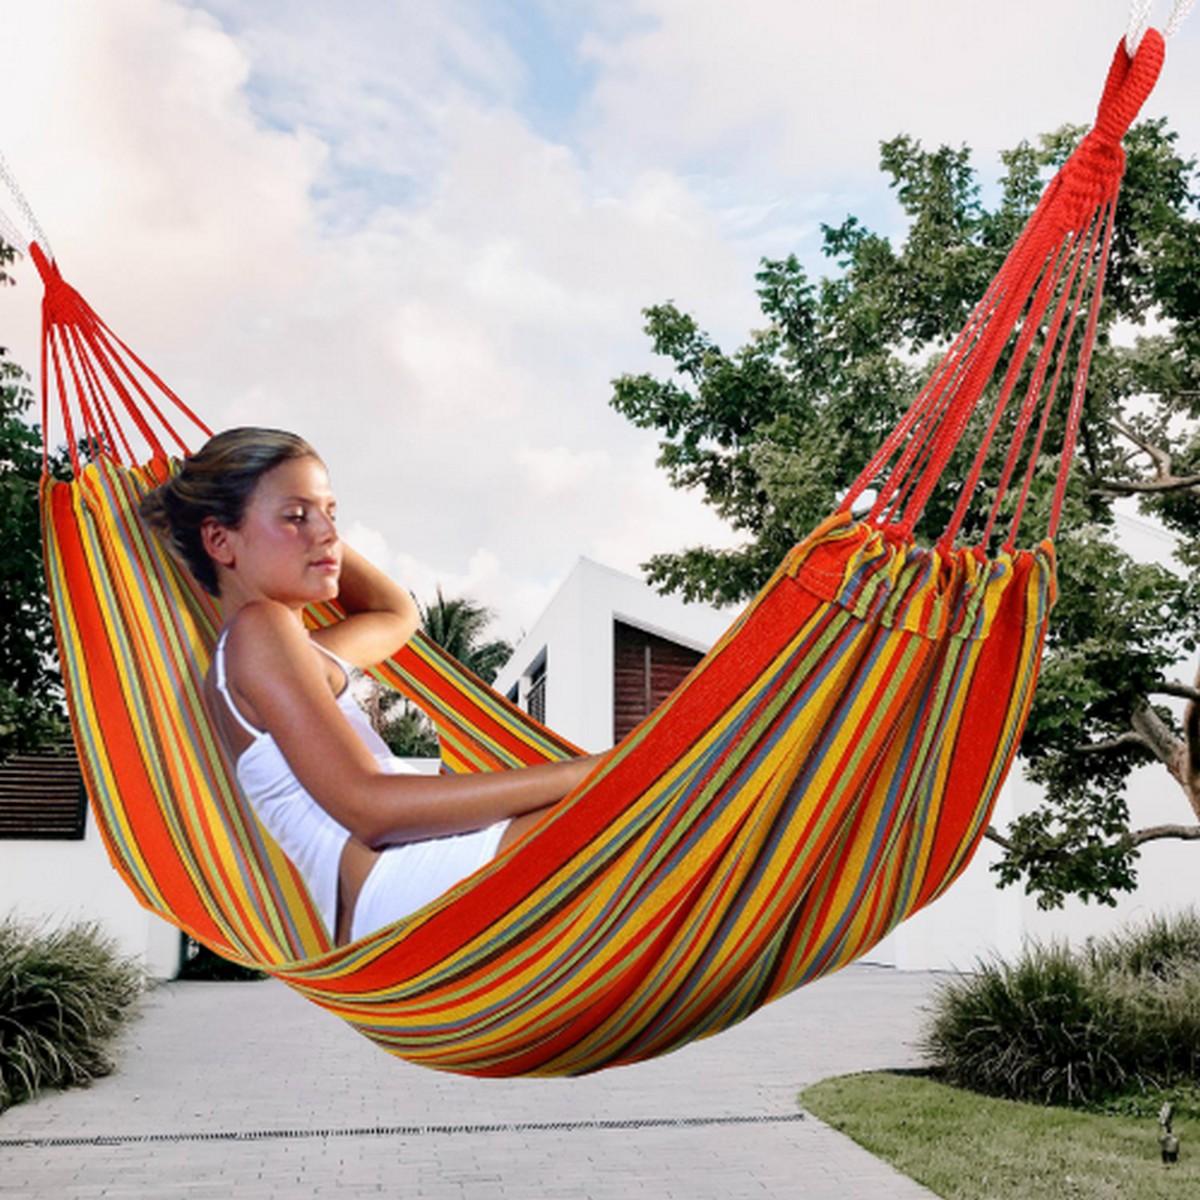 Wayfair Giant Portable Outdoor Paracord /Canvas Hammock For Travel Camping Hammock